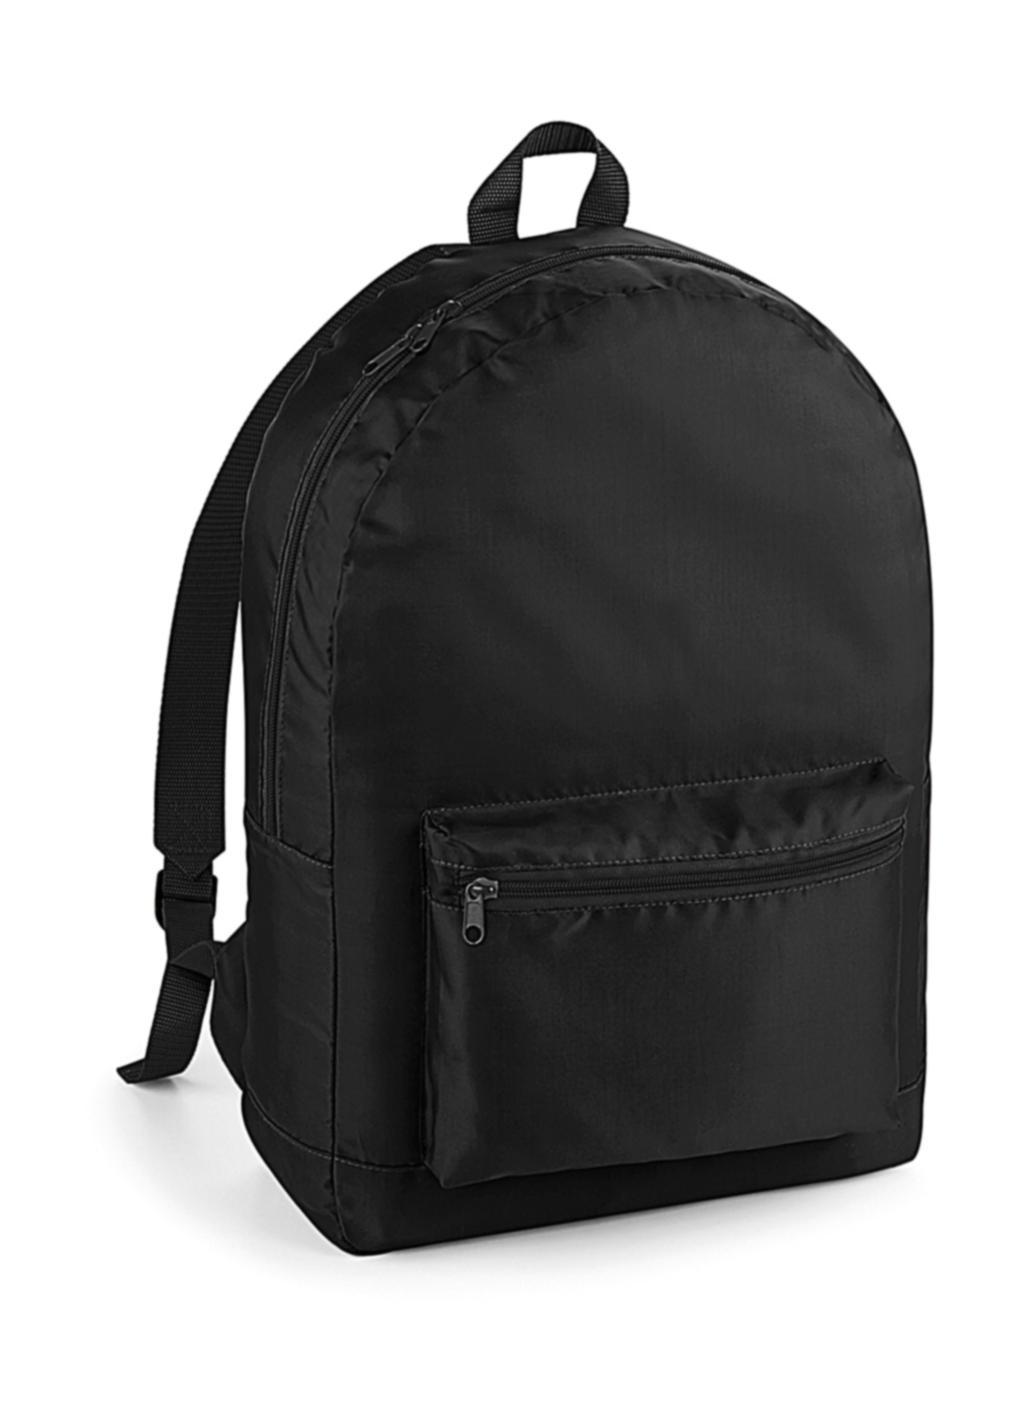 Packaway batoh - zvìtšit obrázek